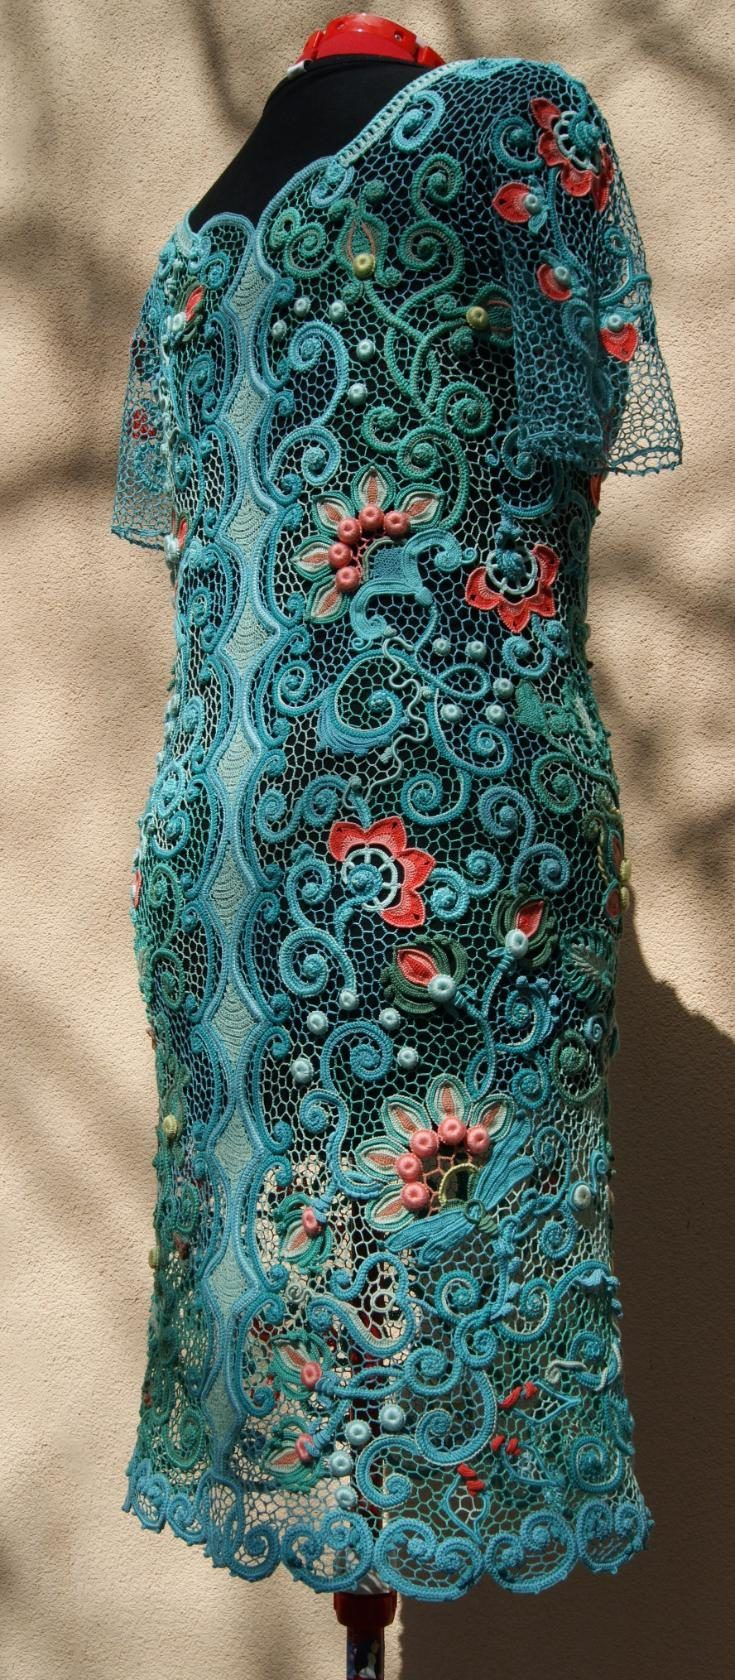 Pin de Yeny Comodoro en tejidos | Pinterest | Blusas de crochet ...